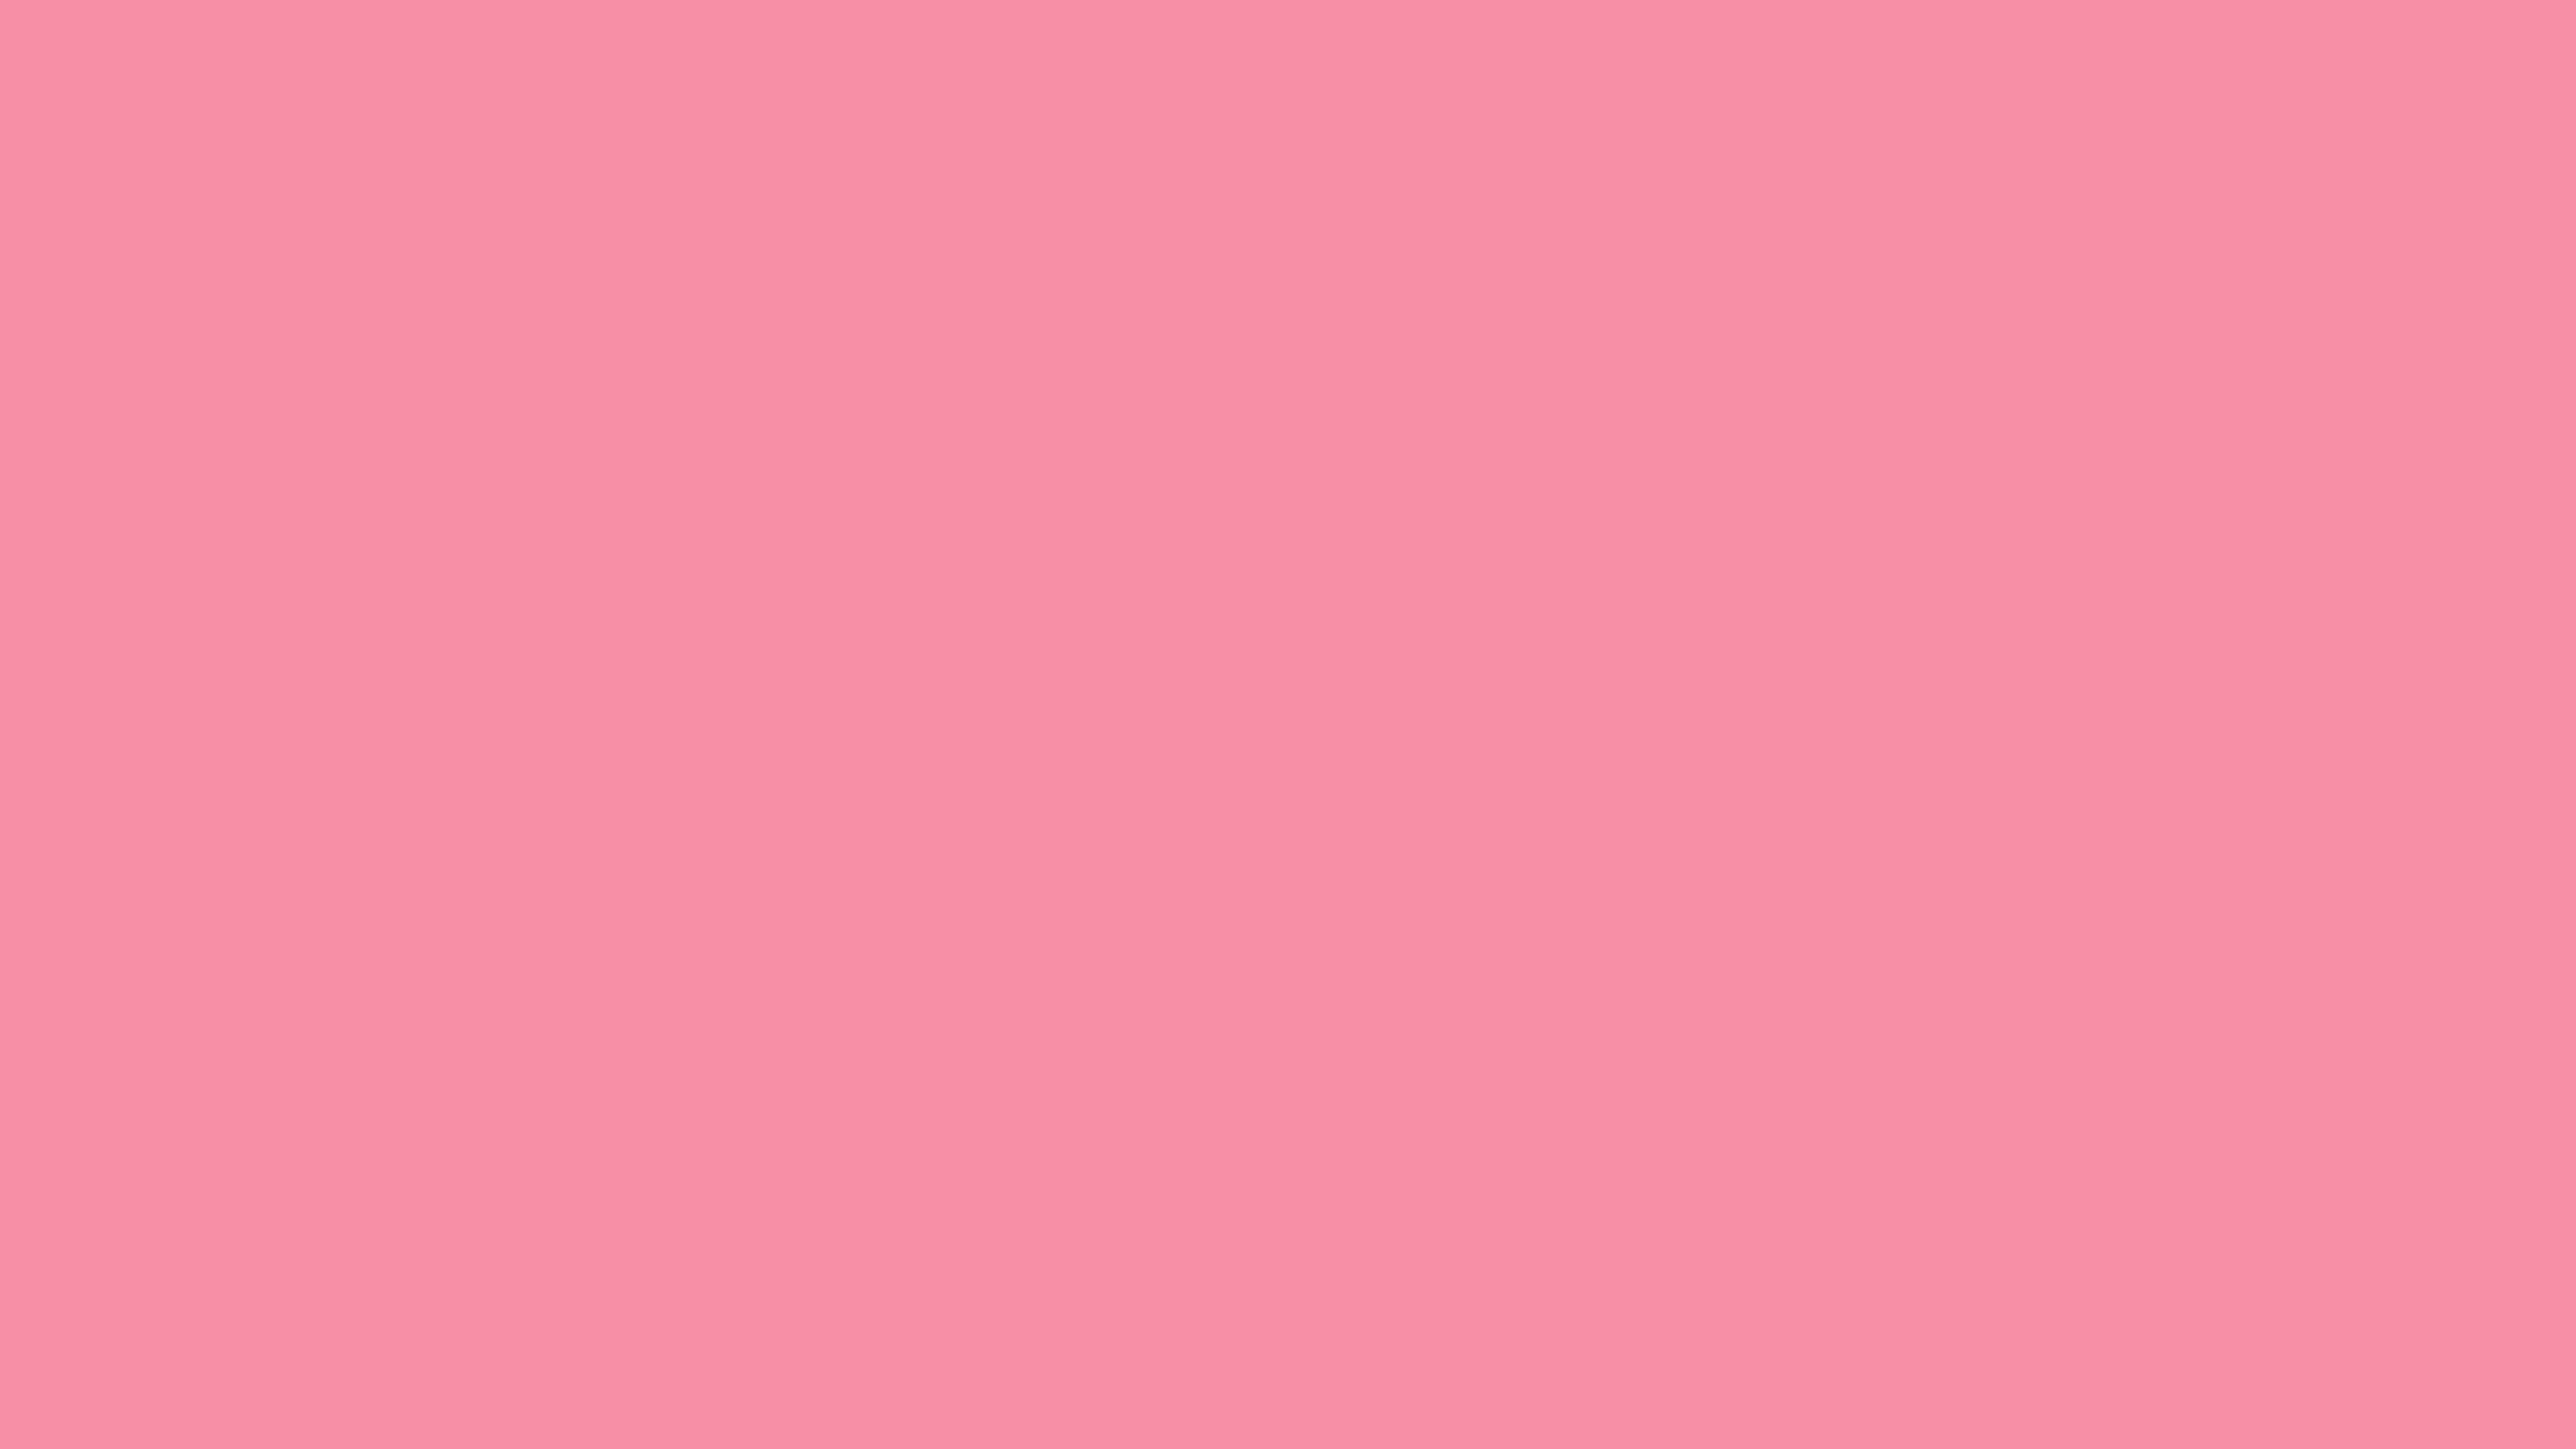 3840x2160 Pink Sherbet Solid Color Background